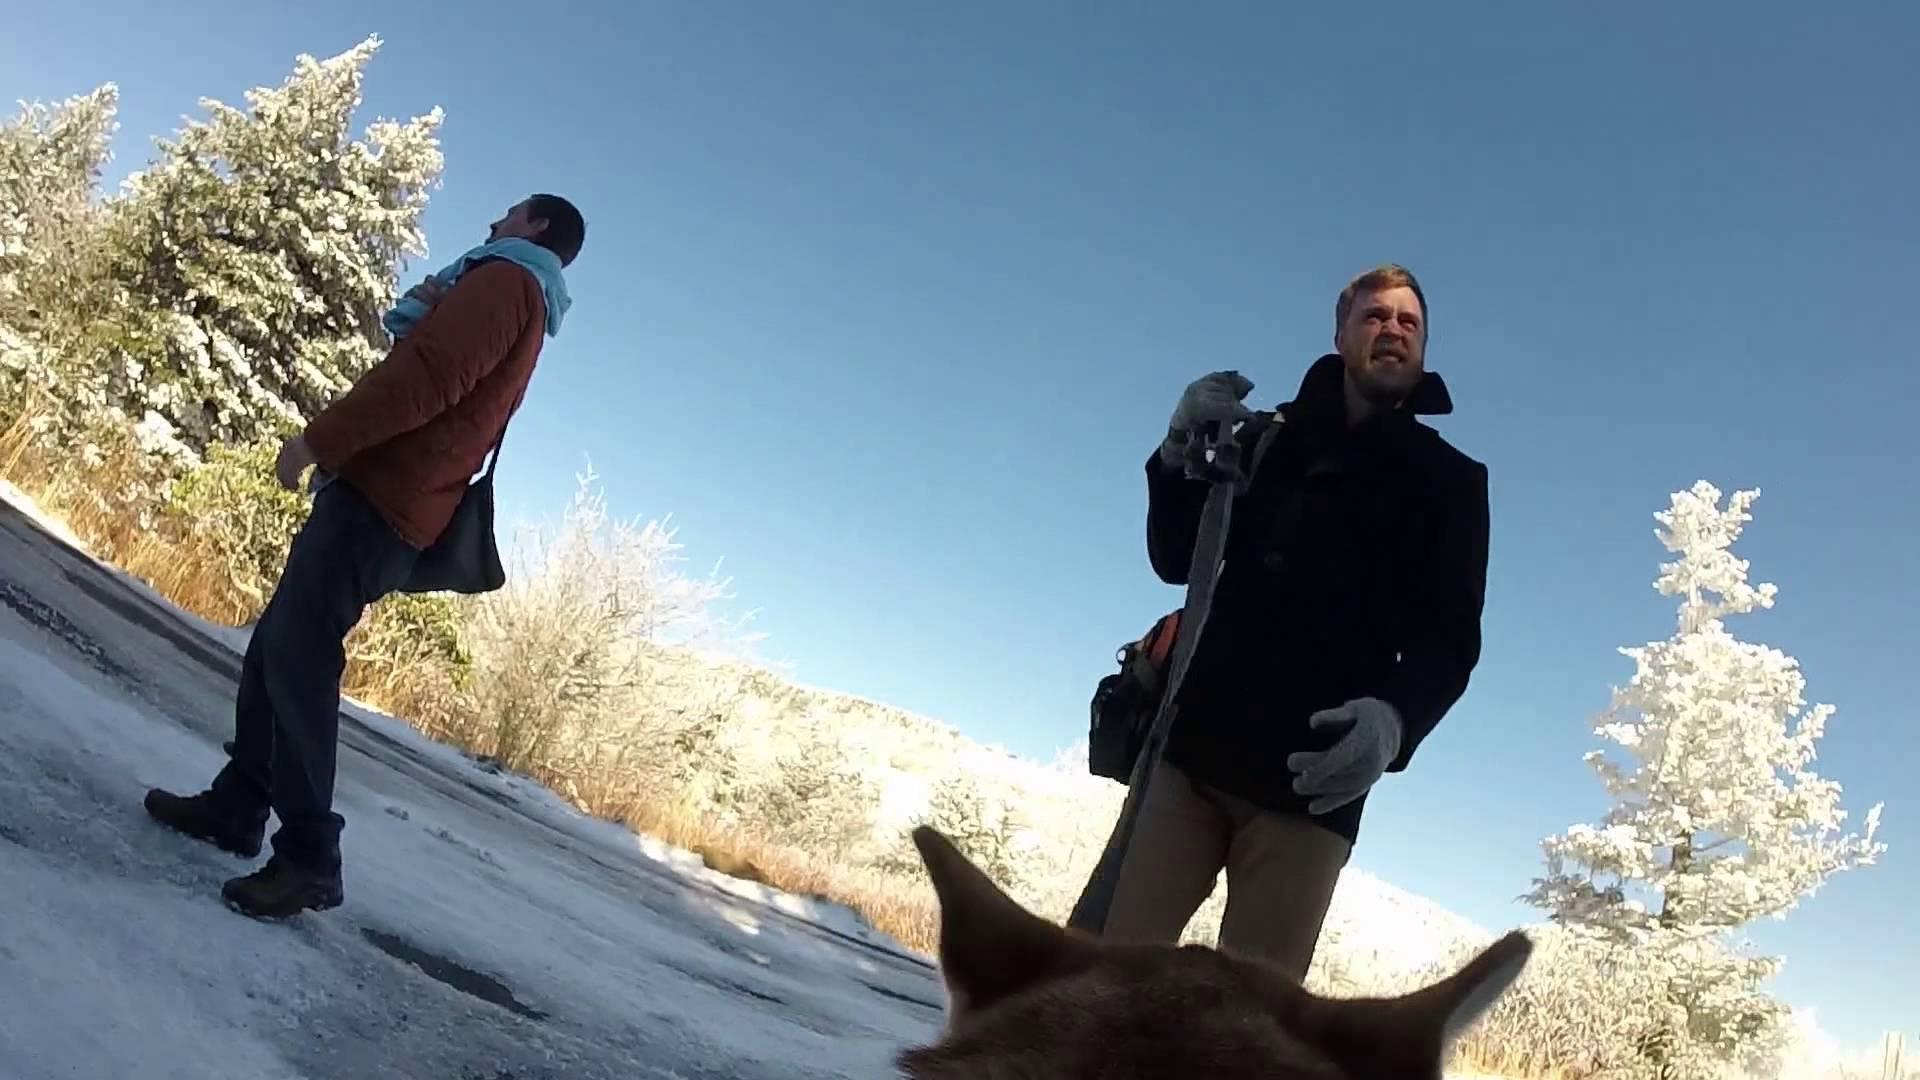 GoPro: Our Snowy Wedding